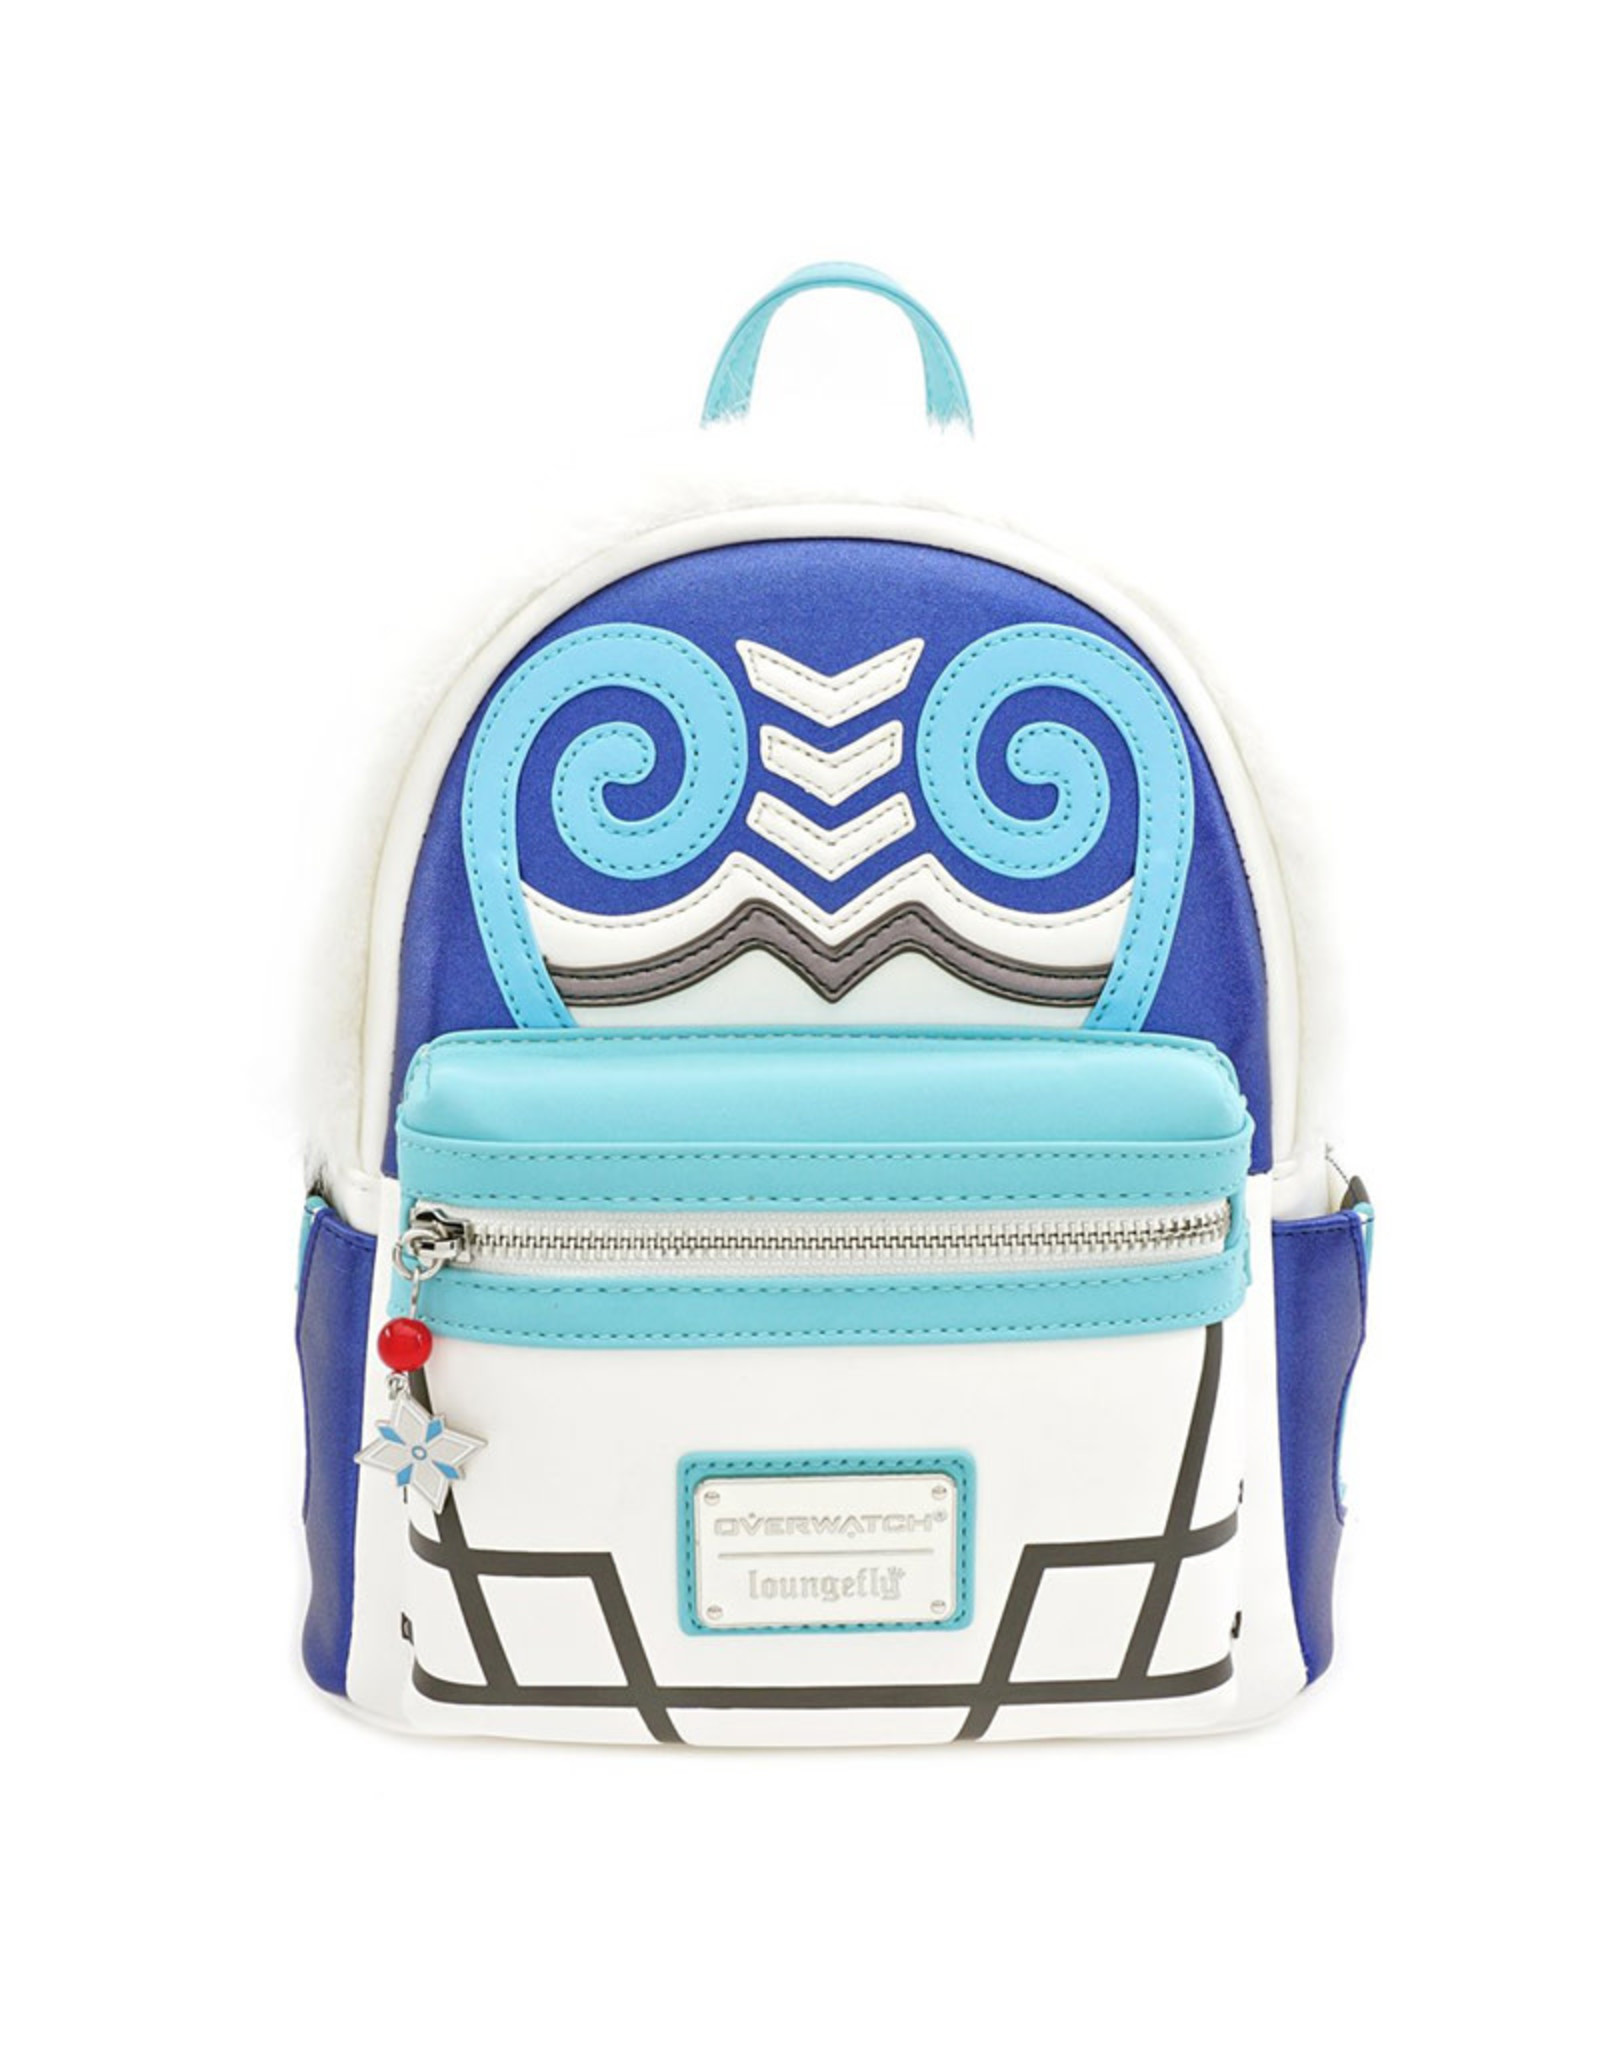 Overwatch ( Loungefly Backpack) Mei